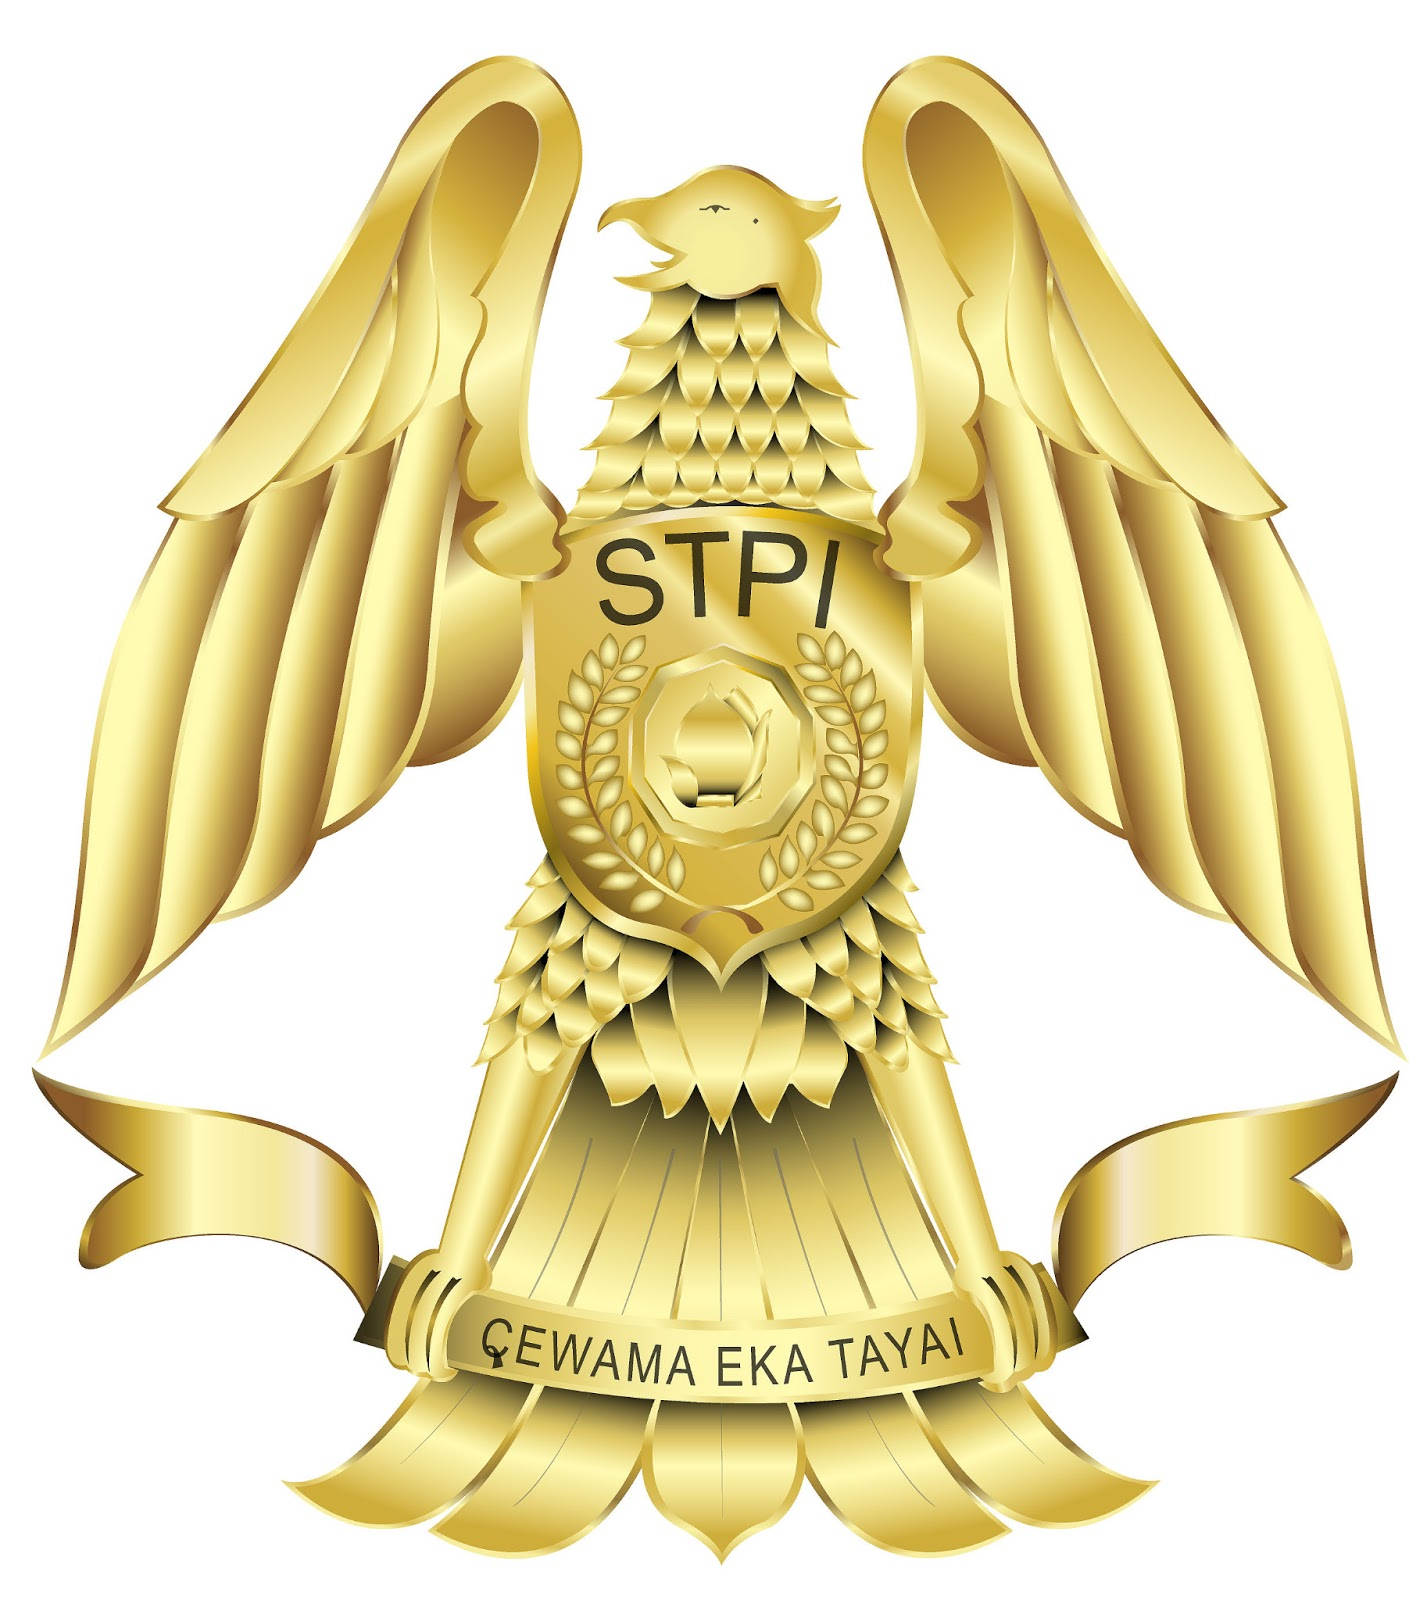 Pendaftaran Pln 2013 Petunjuk Pendaftaran Online Rekrutmen Pt Pln Persero Sipencantar Stpi Tahun 20132014 Hiburdunia